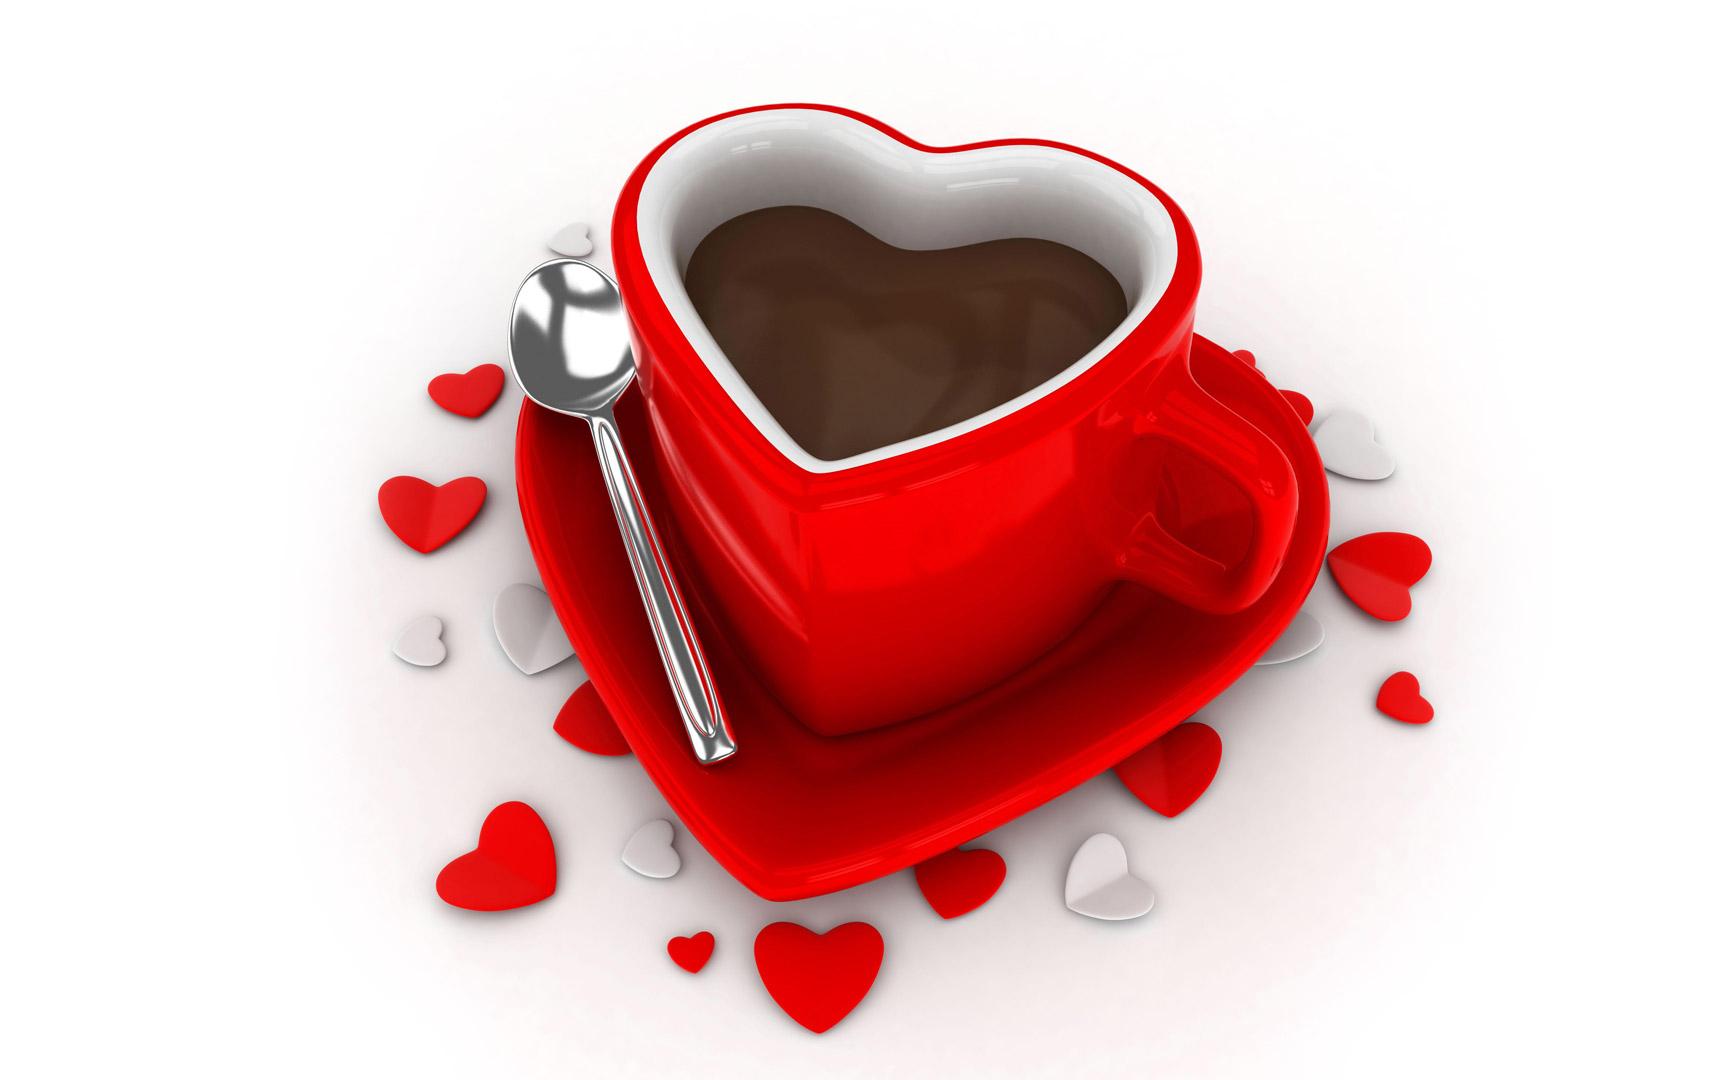 Animated Love Couple Wallpapers 3d Love Heart 13 High Resolution Wallpaper Hdlovewall Com